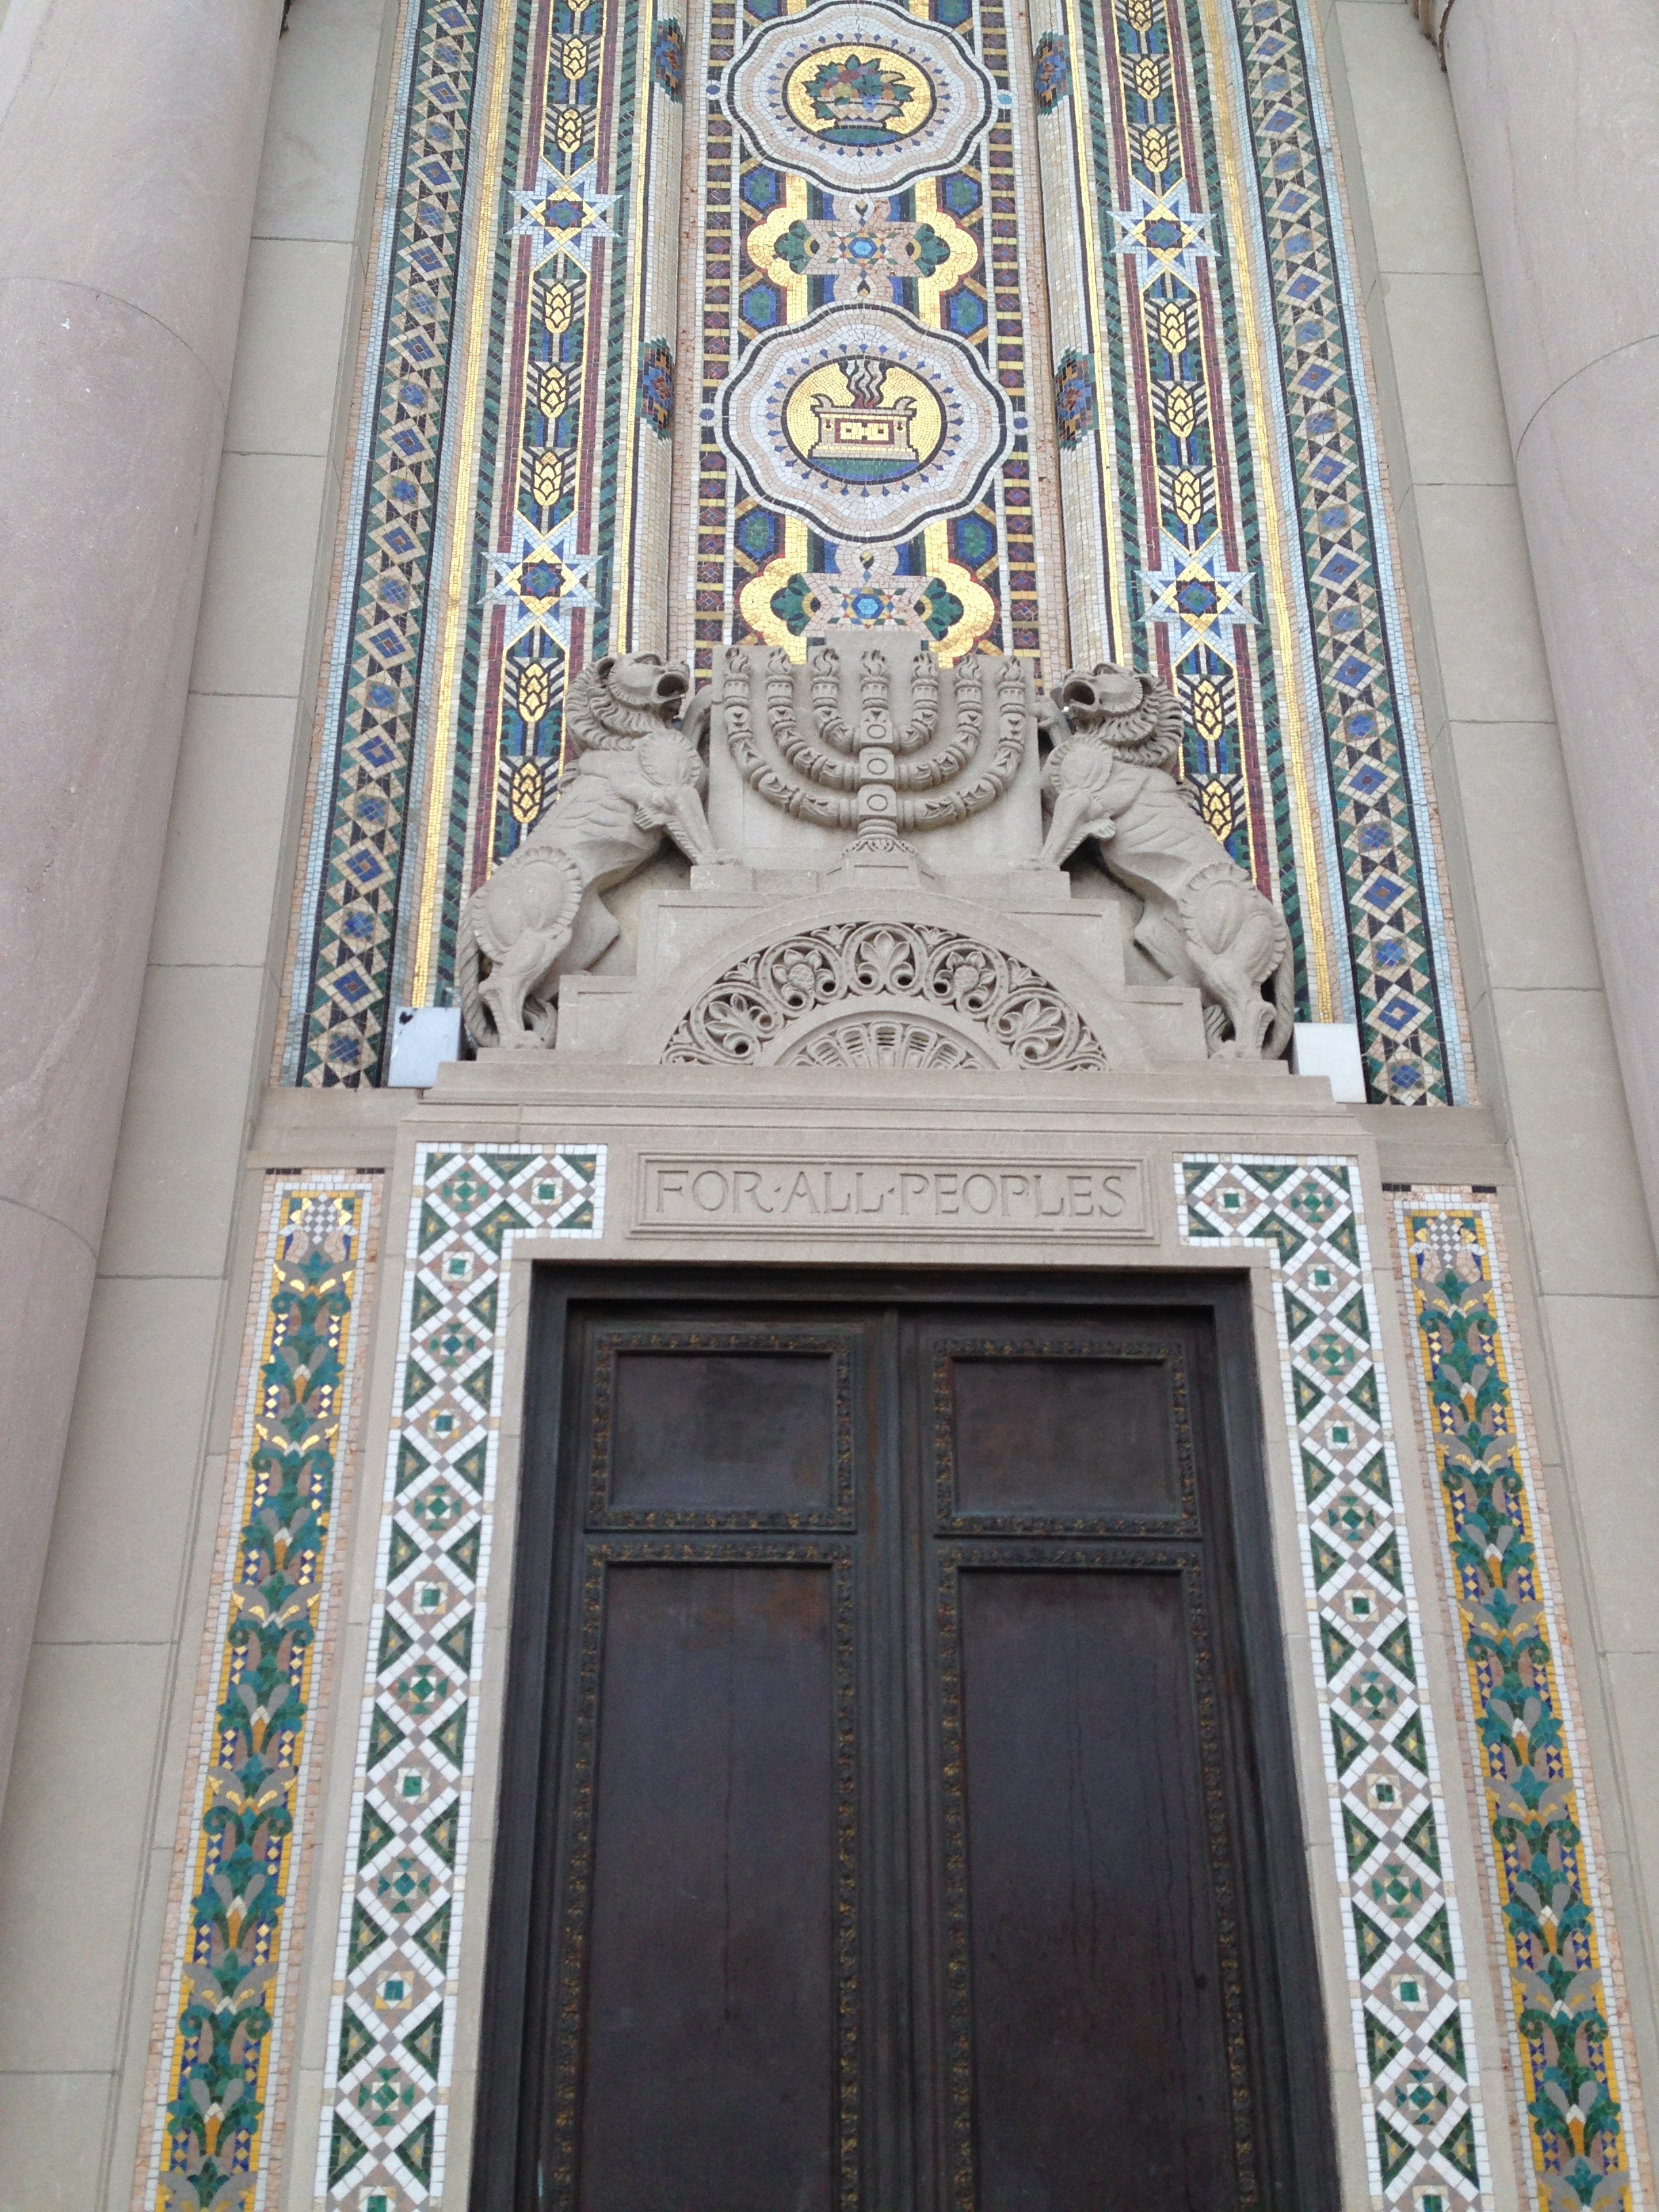 Facade of Rodeph Shalom